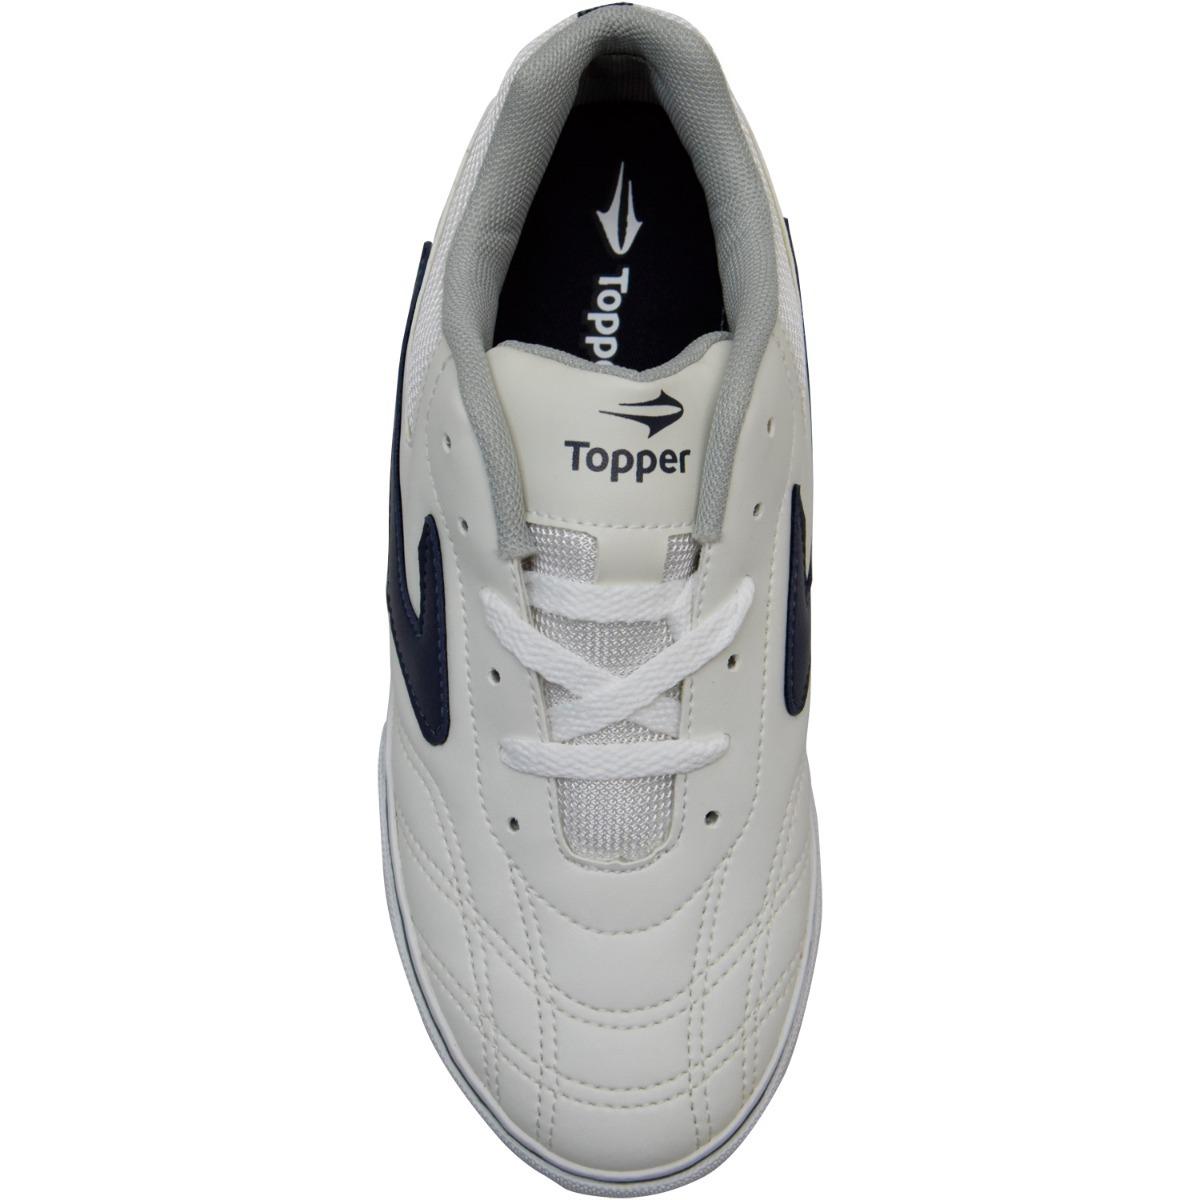 Tênis Futsal Topper Preto   Branco Masculino Feminino Vôlei - R  119 ... c5a3dff9361a1